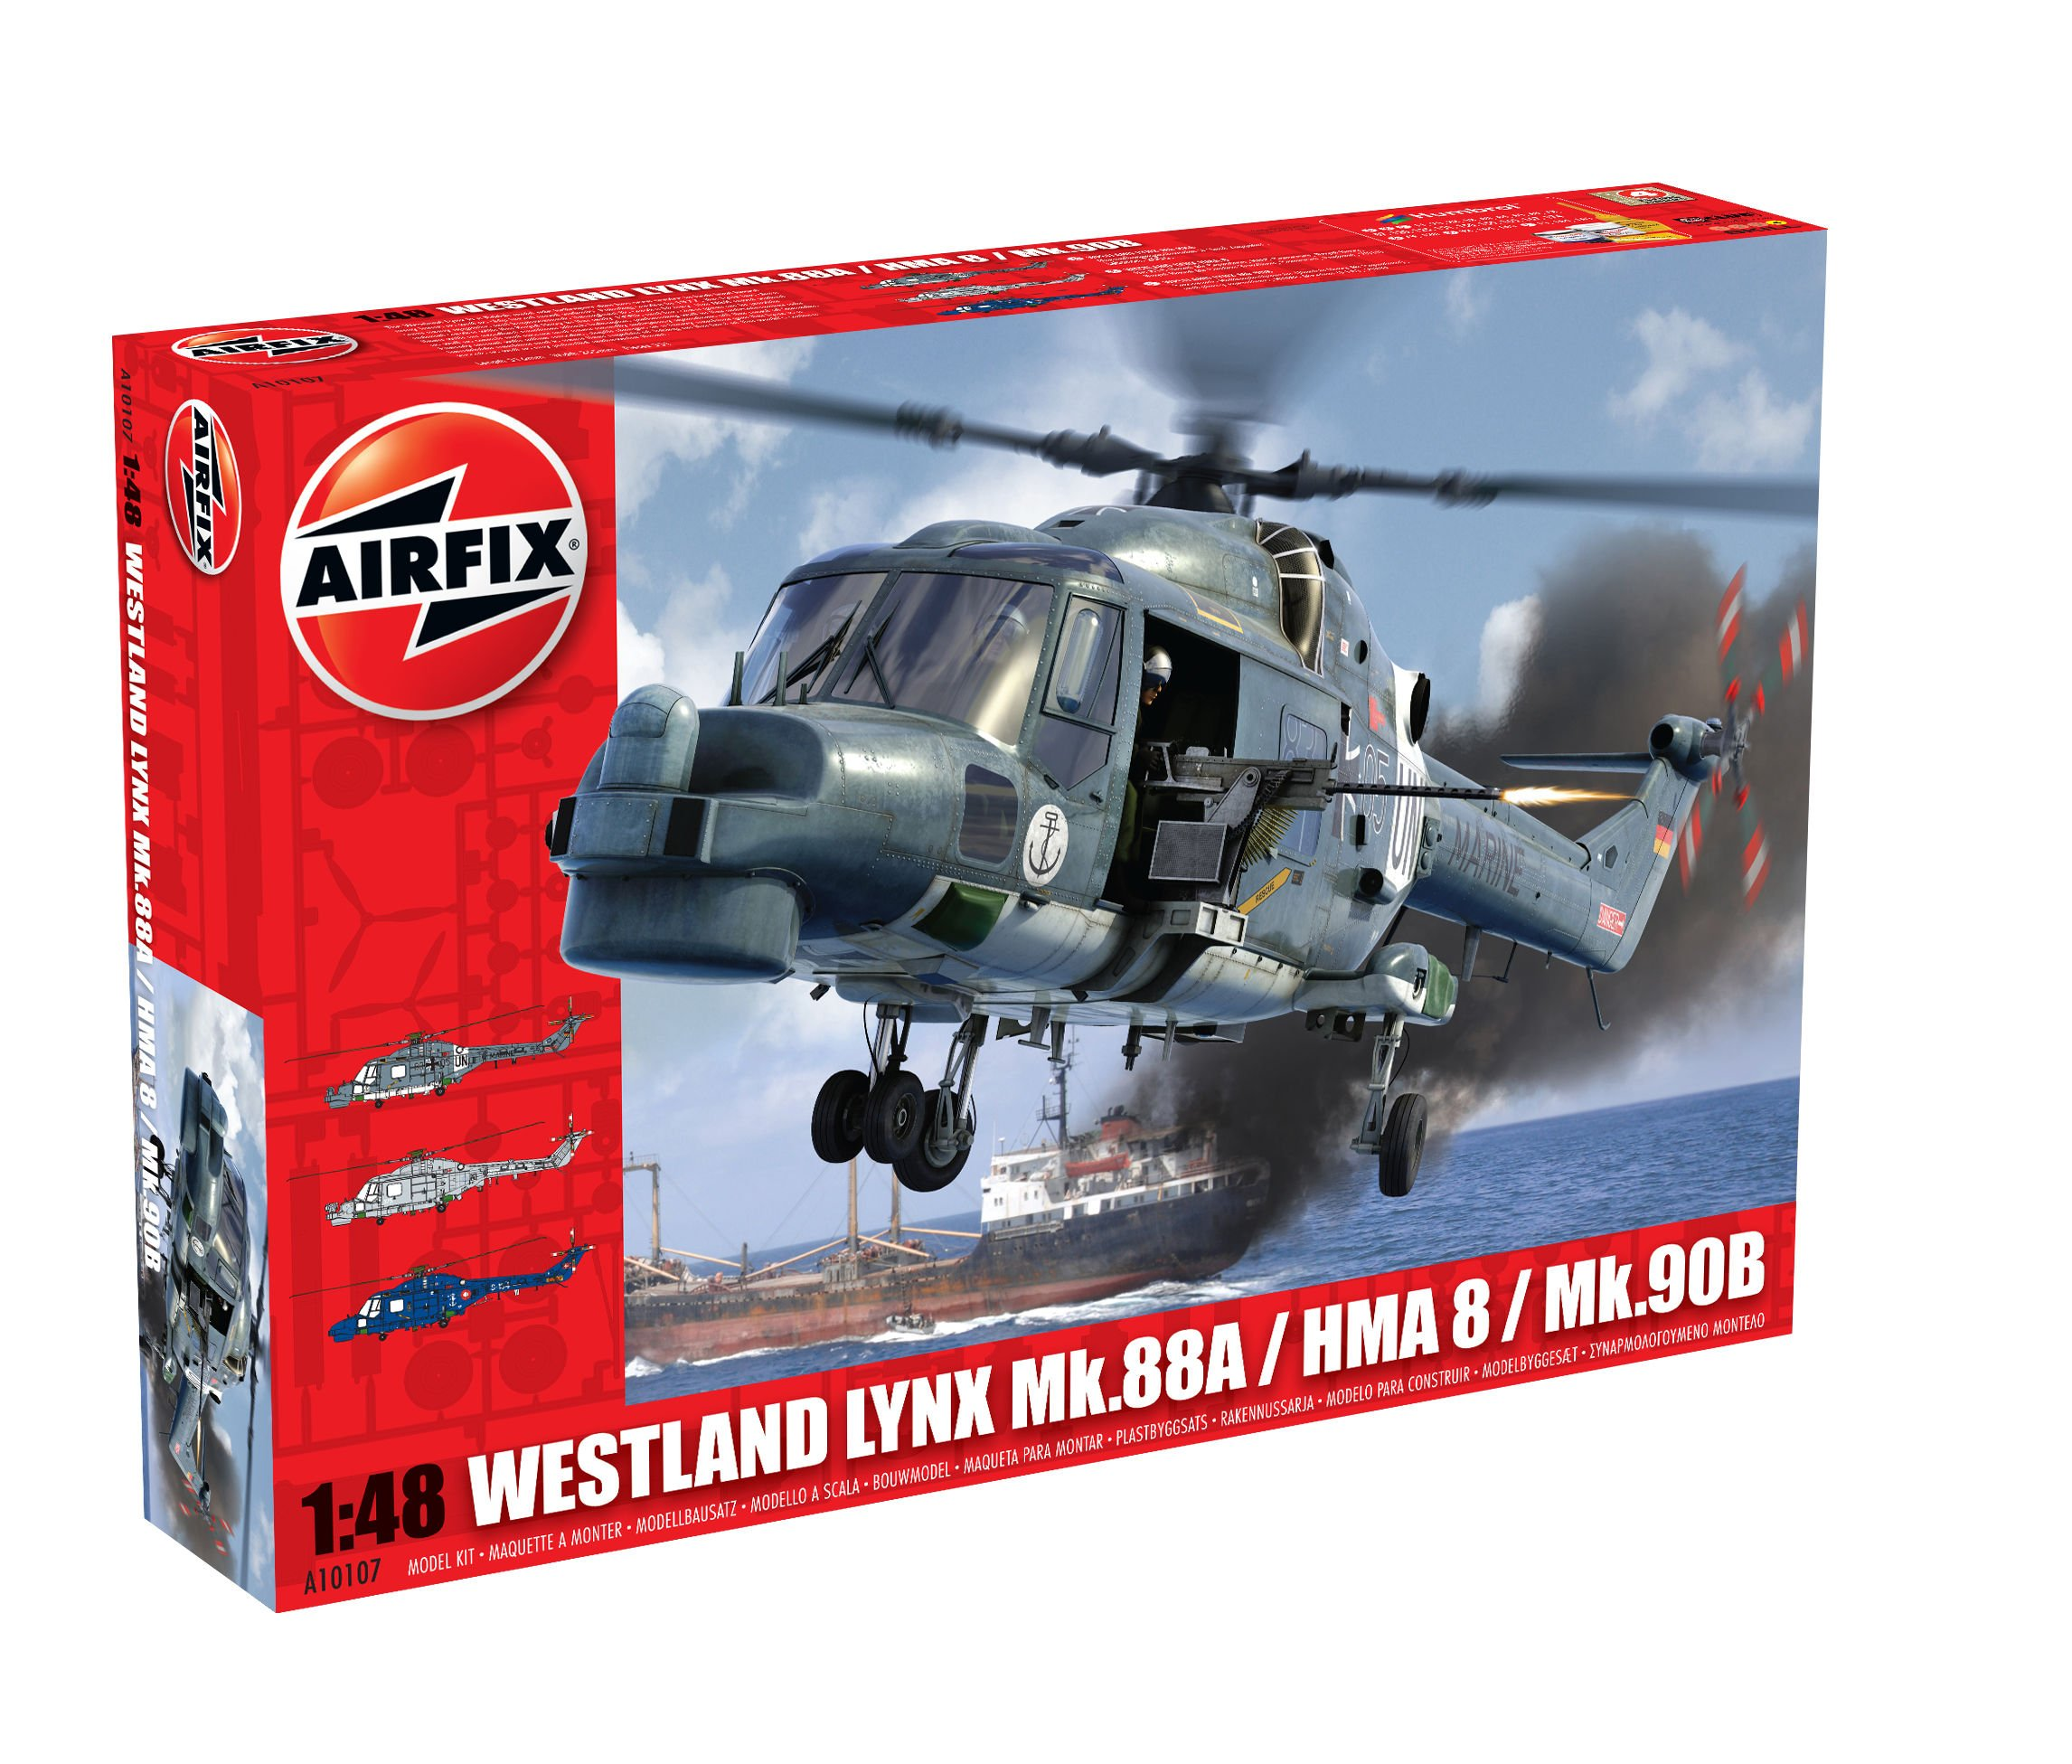 Airfix A10107 Westland Lynx Navy HMA8/Super Model Building Kit, 1:48 Scale